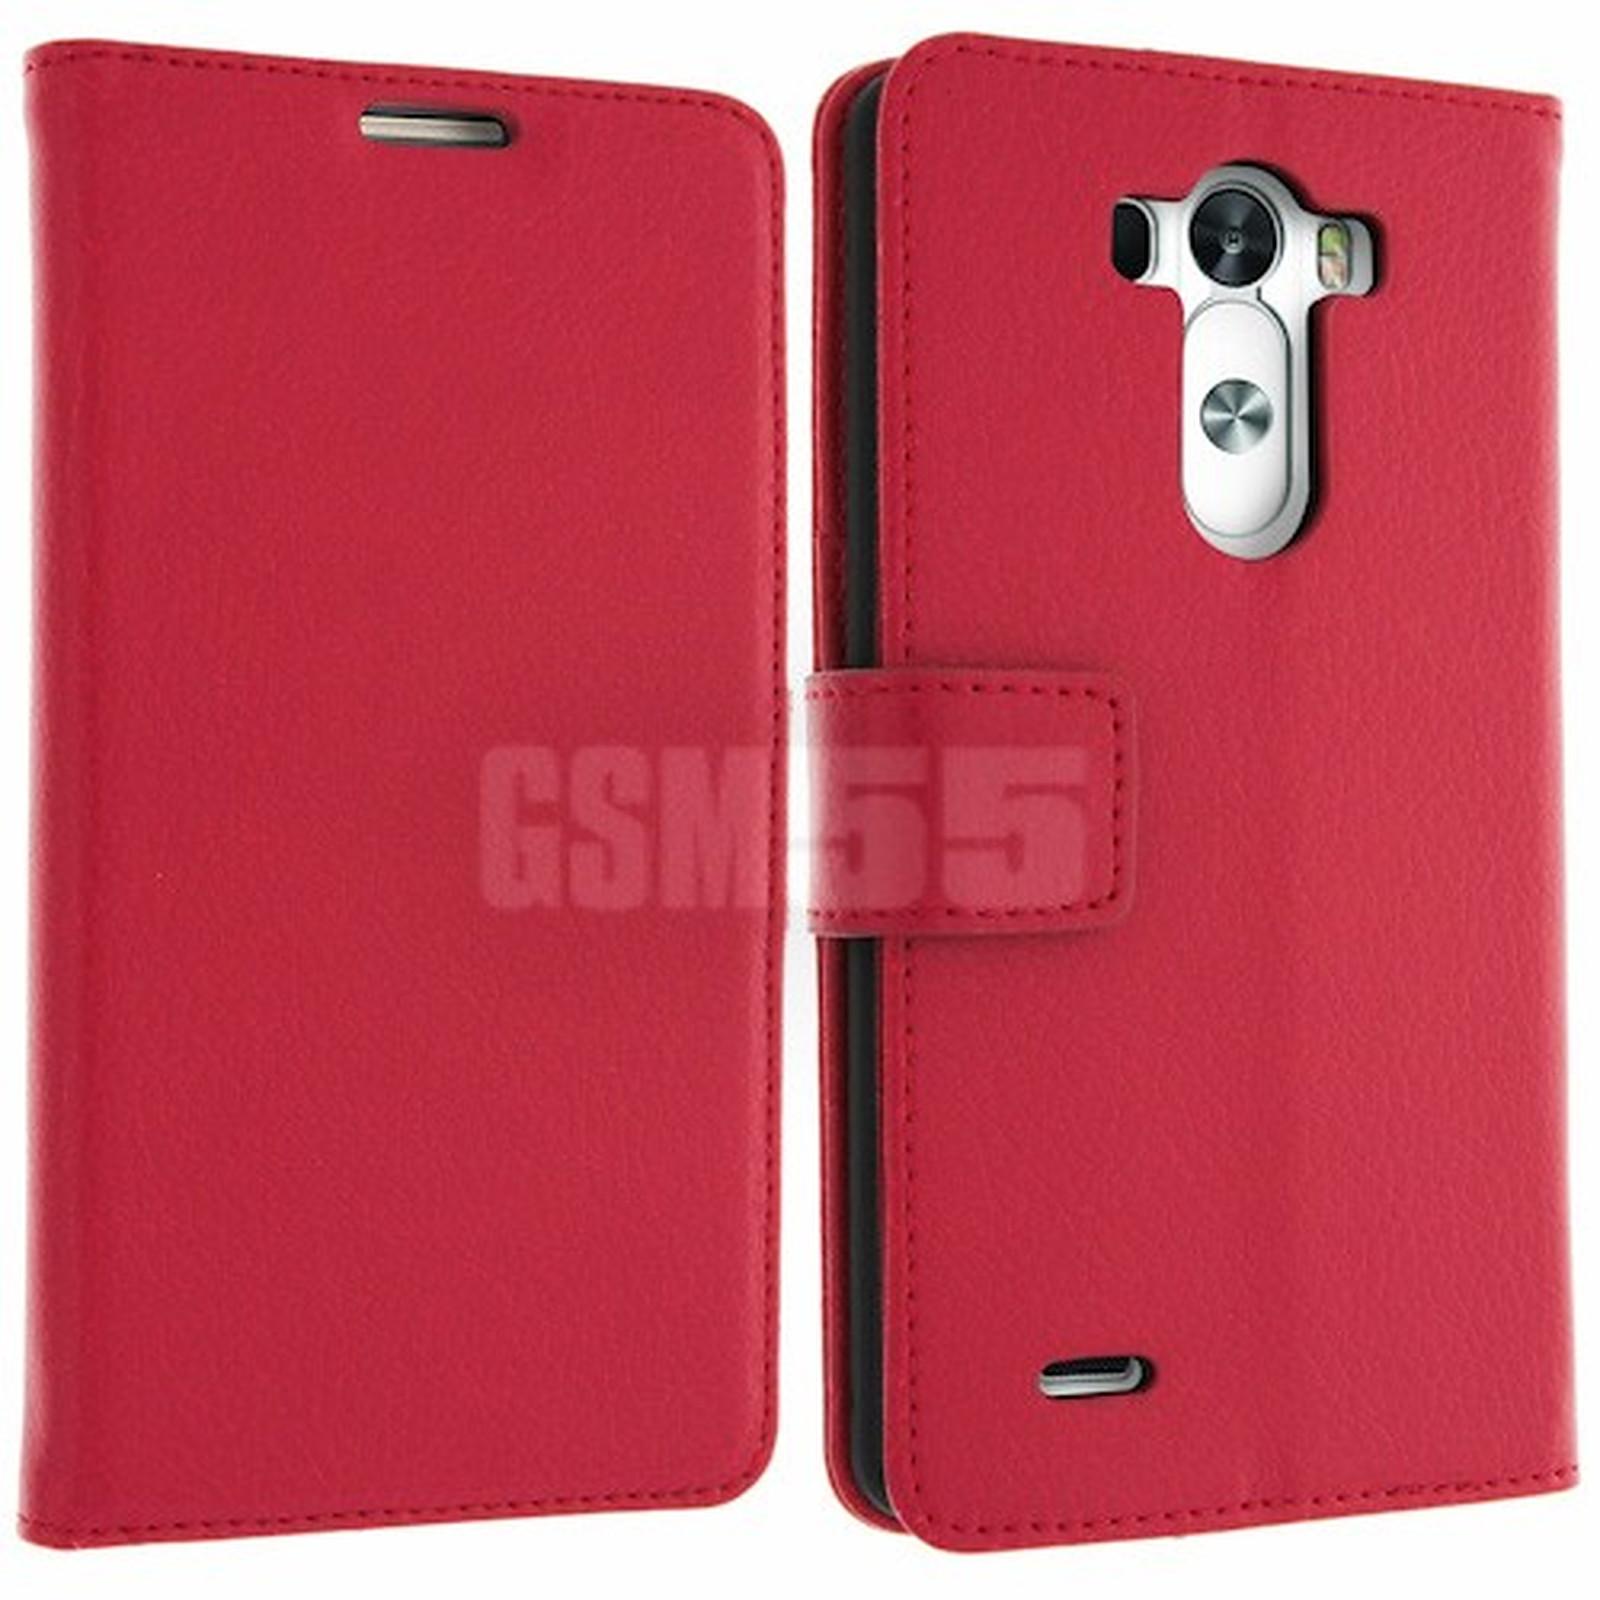 Avizar Etui folio Rouge pour LG G3